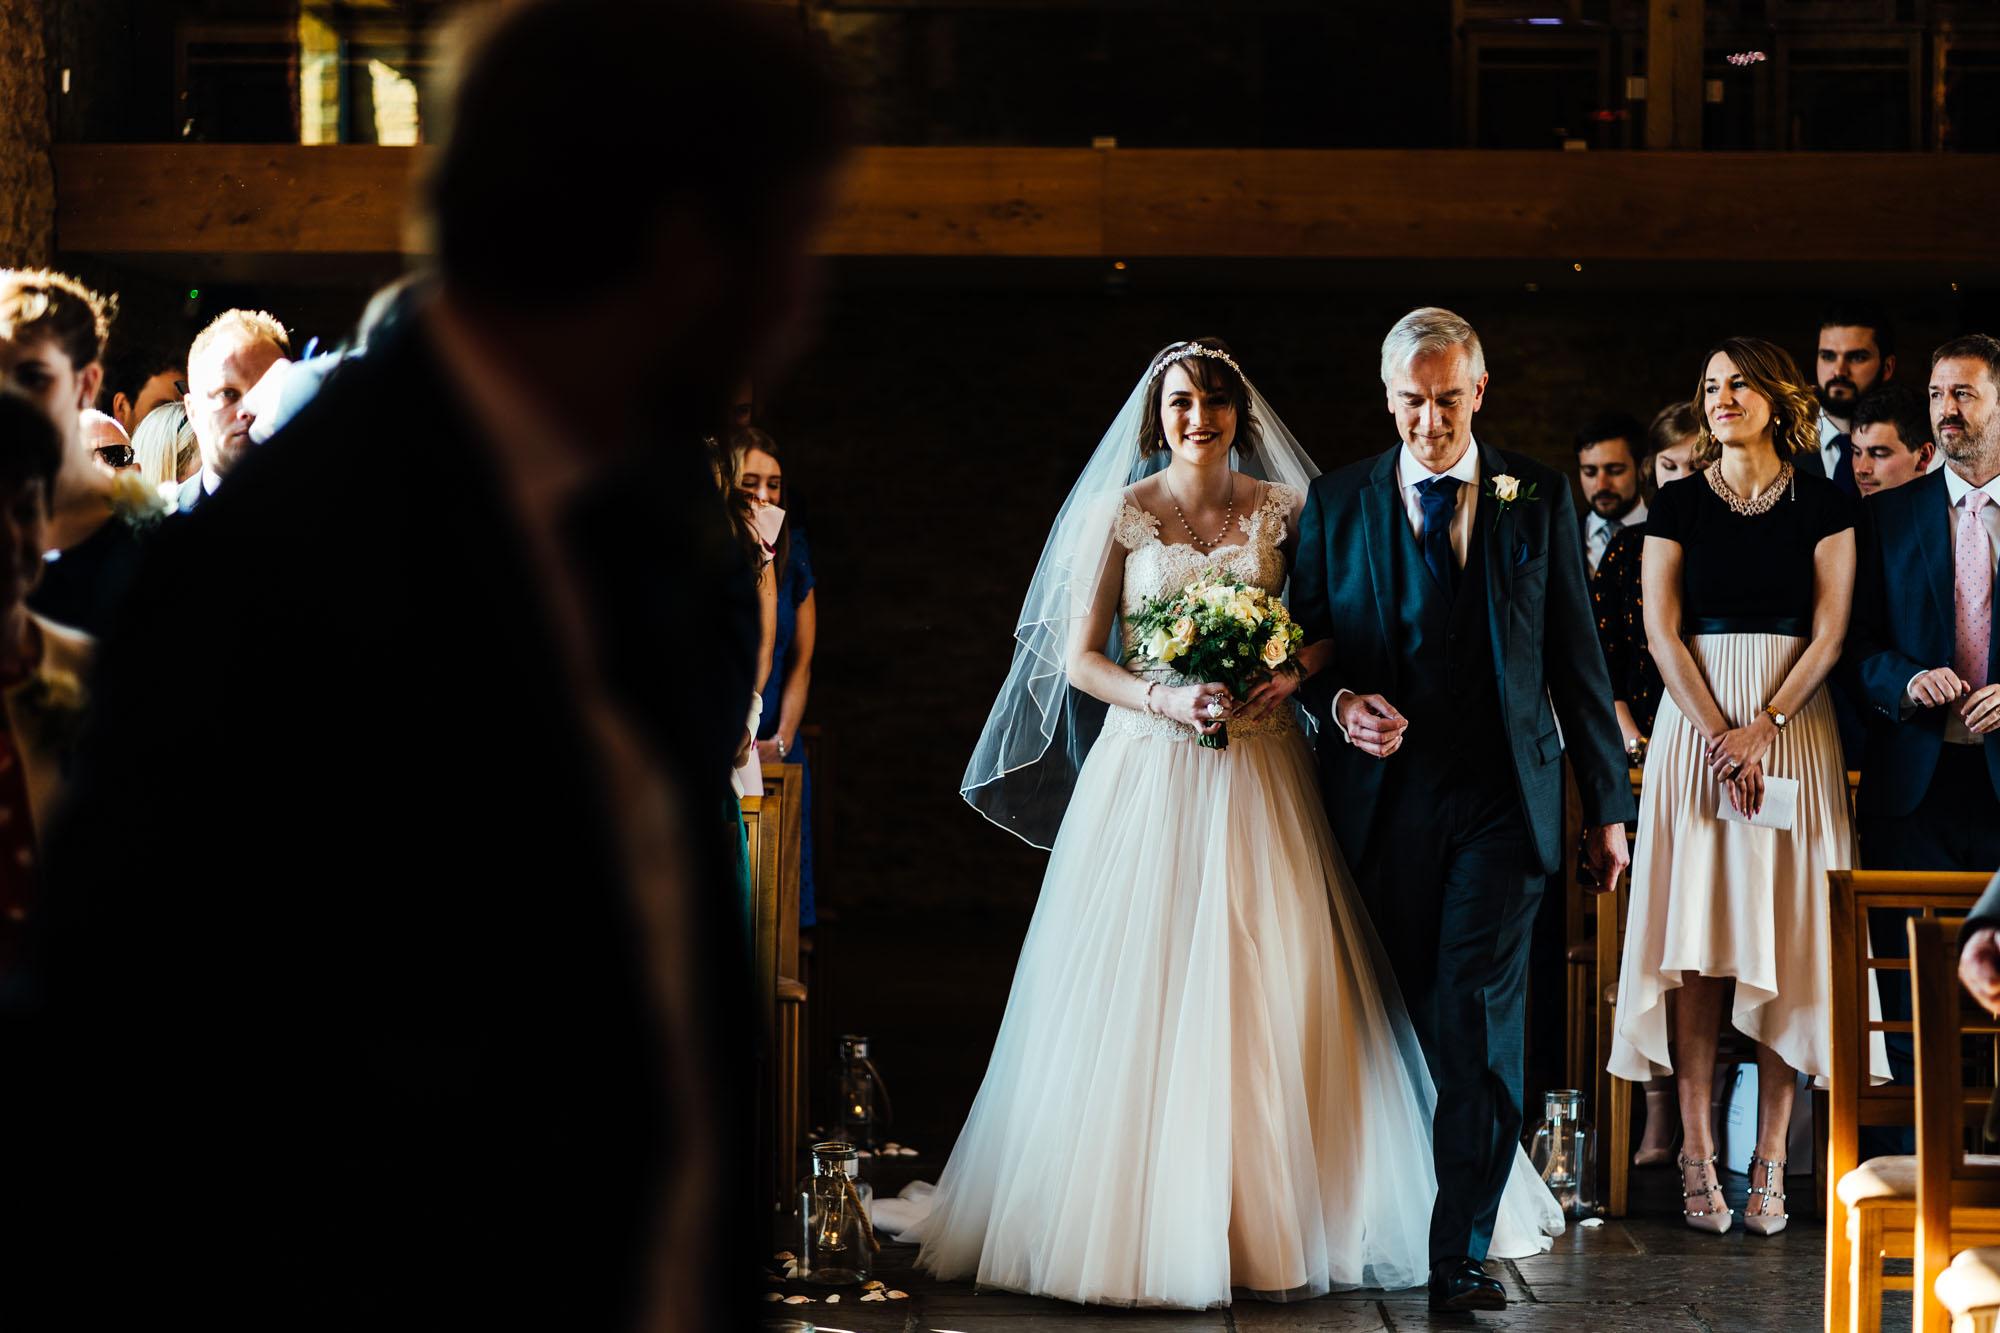 wedding-at-dodford-manor-35